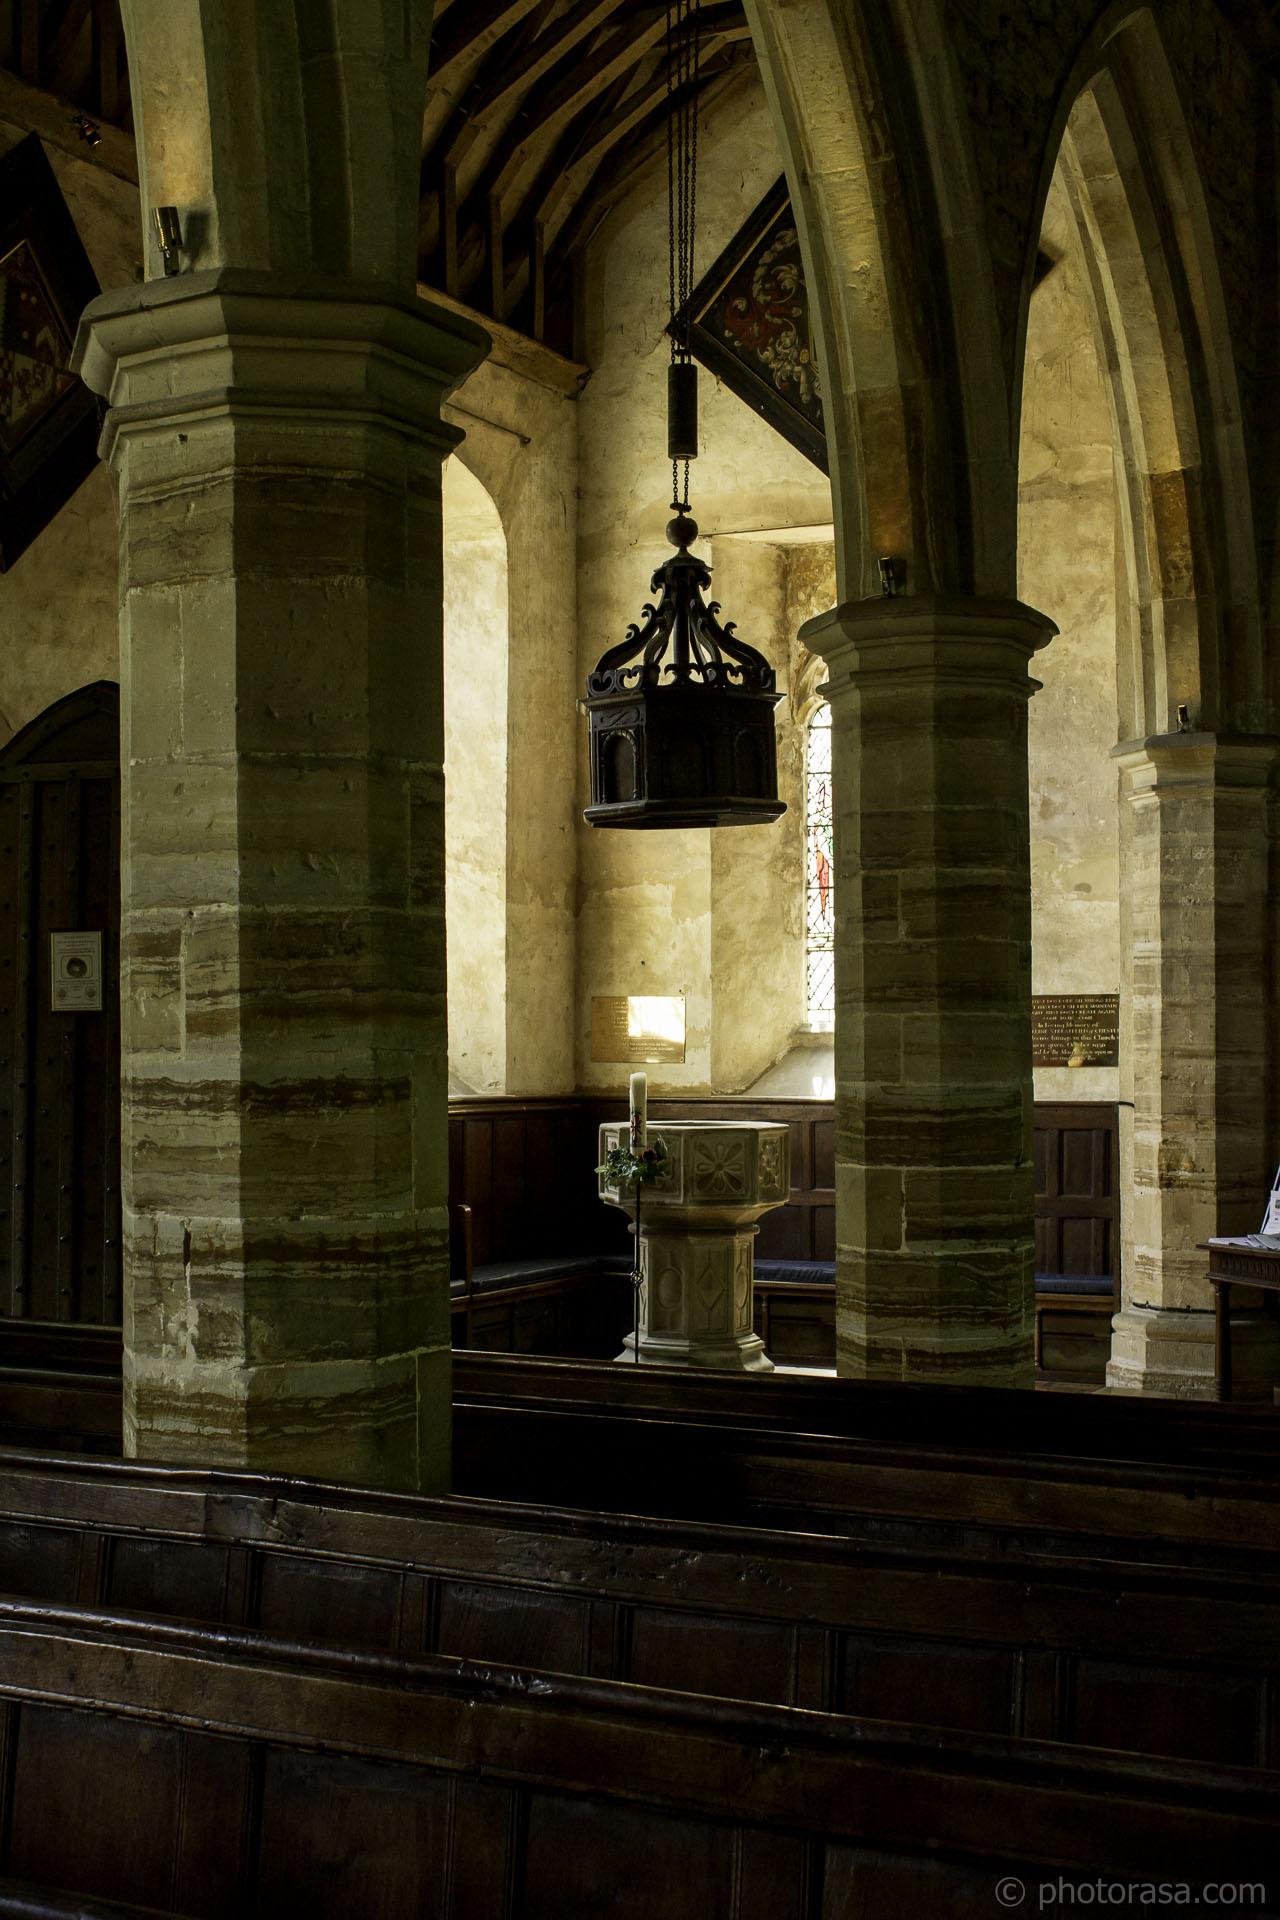 https://photorasa.com/st-marys-church-in-chiddingstone/font-at-church-of-saint-mary/